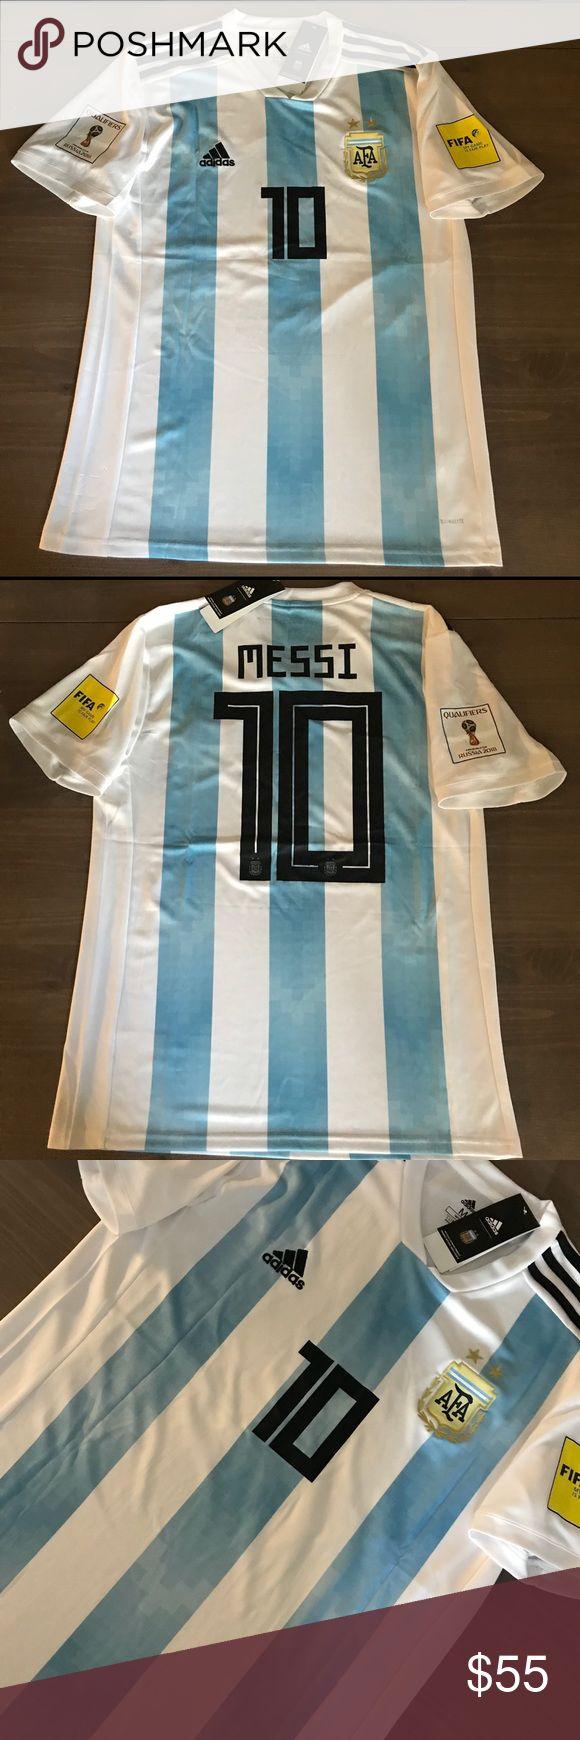 Argentina Messi #10 Men Adidas jersey 17/18 Argentina Messi #10 17/18 National team Soccer jersey Russia World Cup 2018 Men Adidas adidas Shirts Tees - Short Sleeve